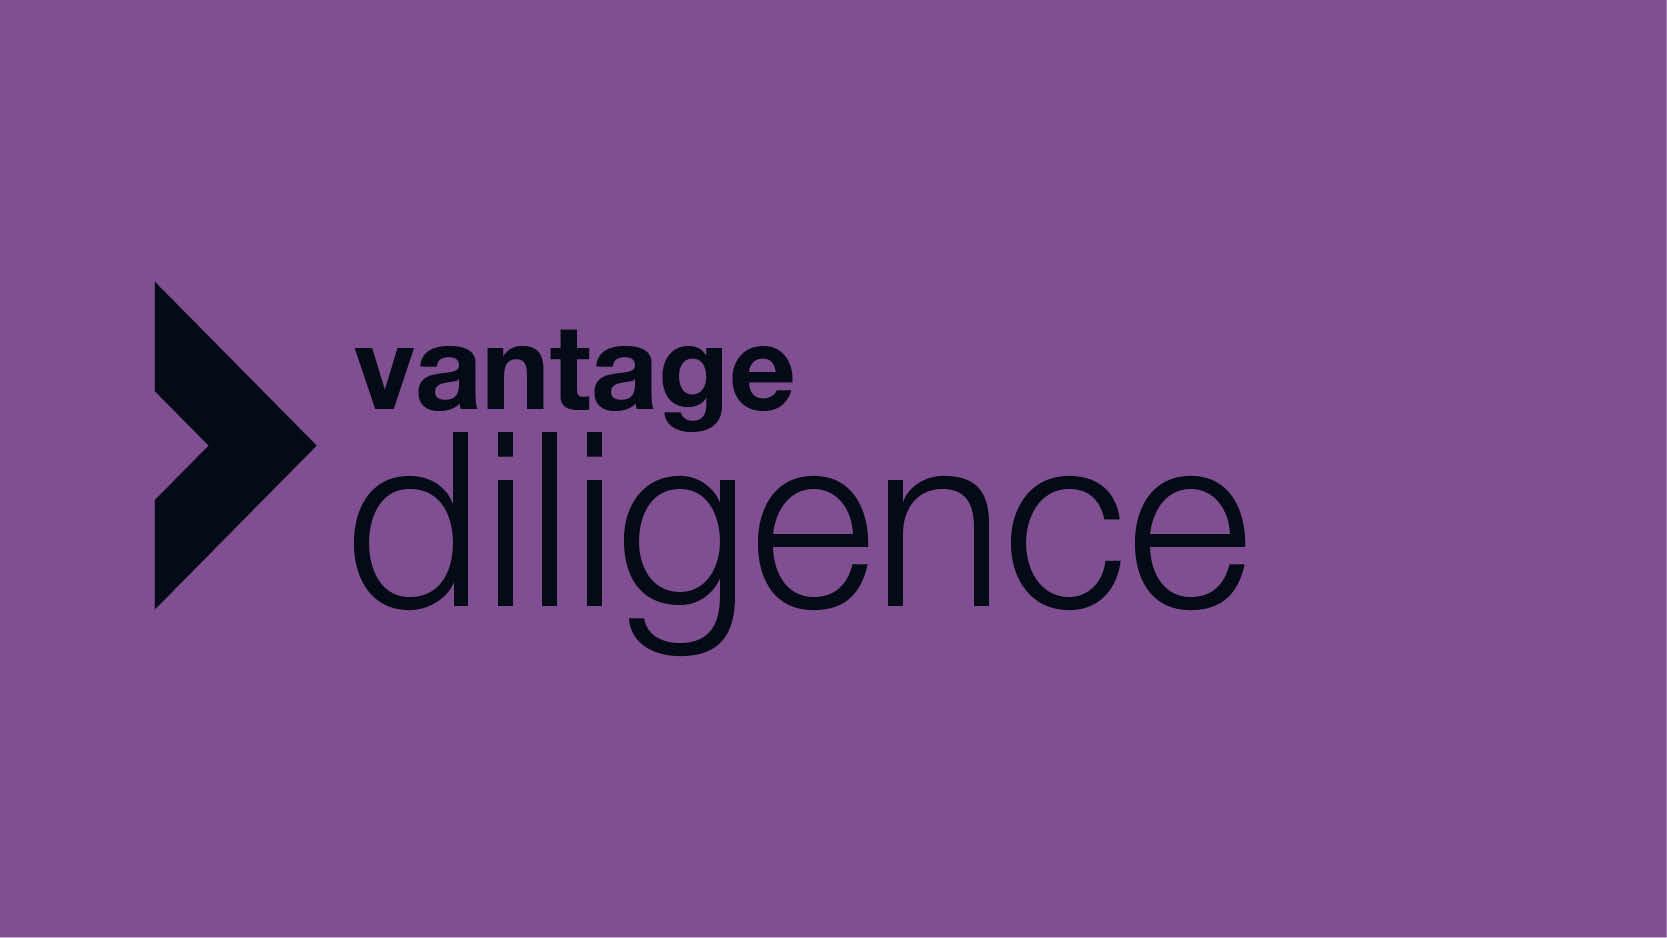 VANTAGE Diligence